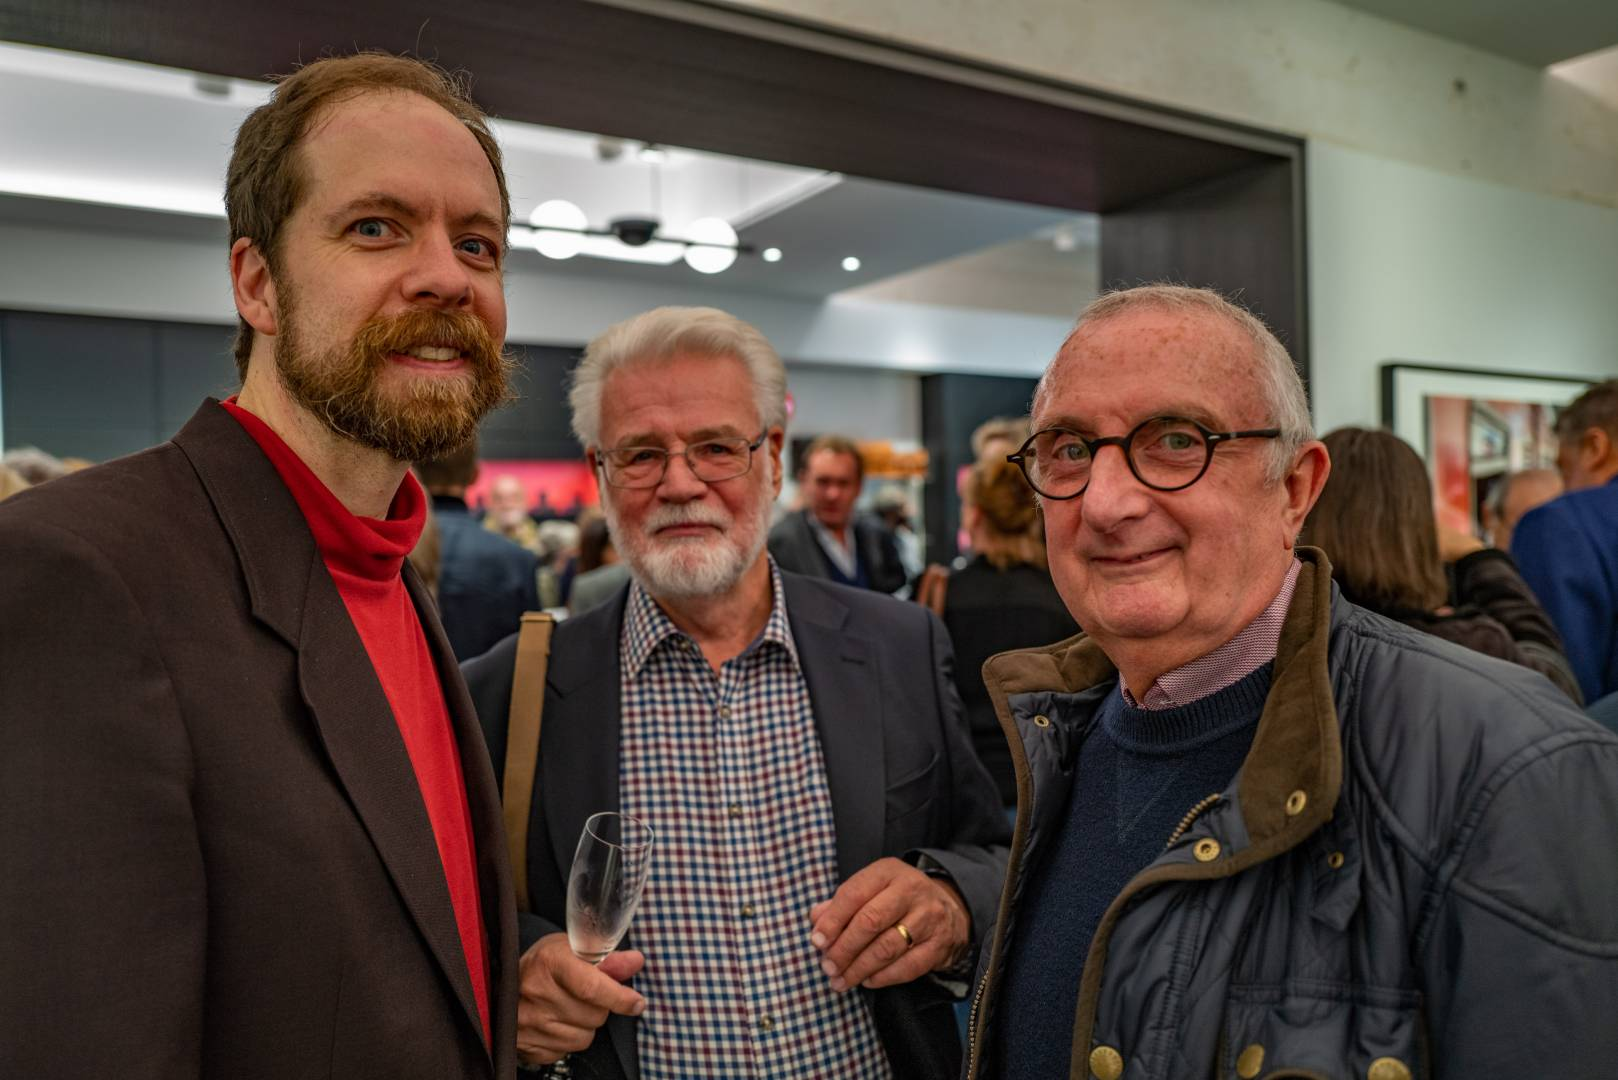 Dan Bachmann, Tony Cole and Tom Lane, all Leica Society members